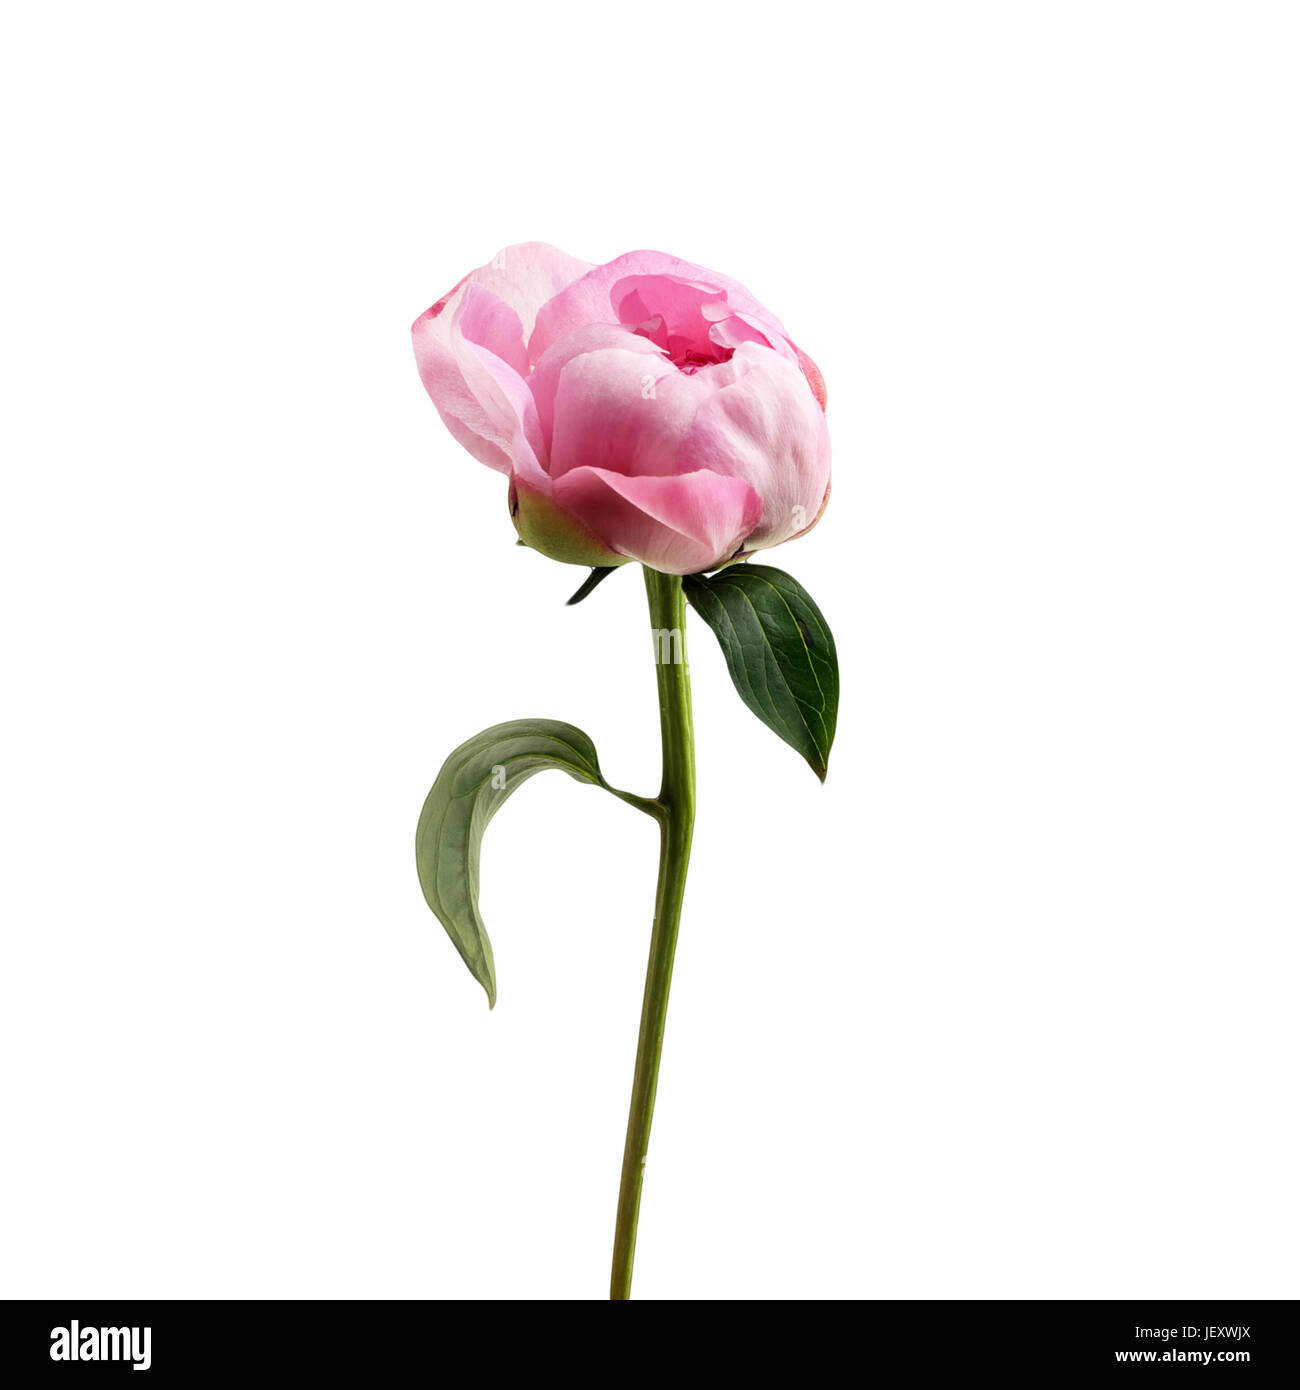 Pink peony flower isolated on white background. - Stock Image